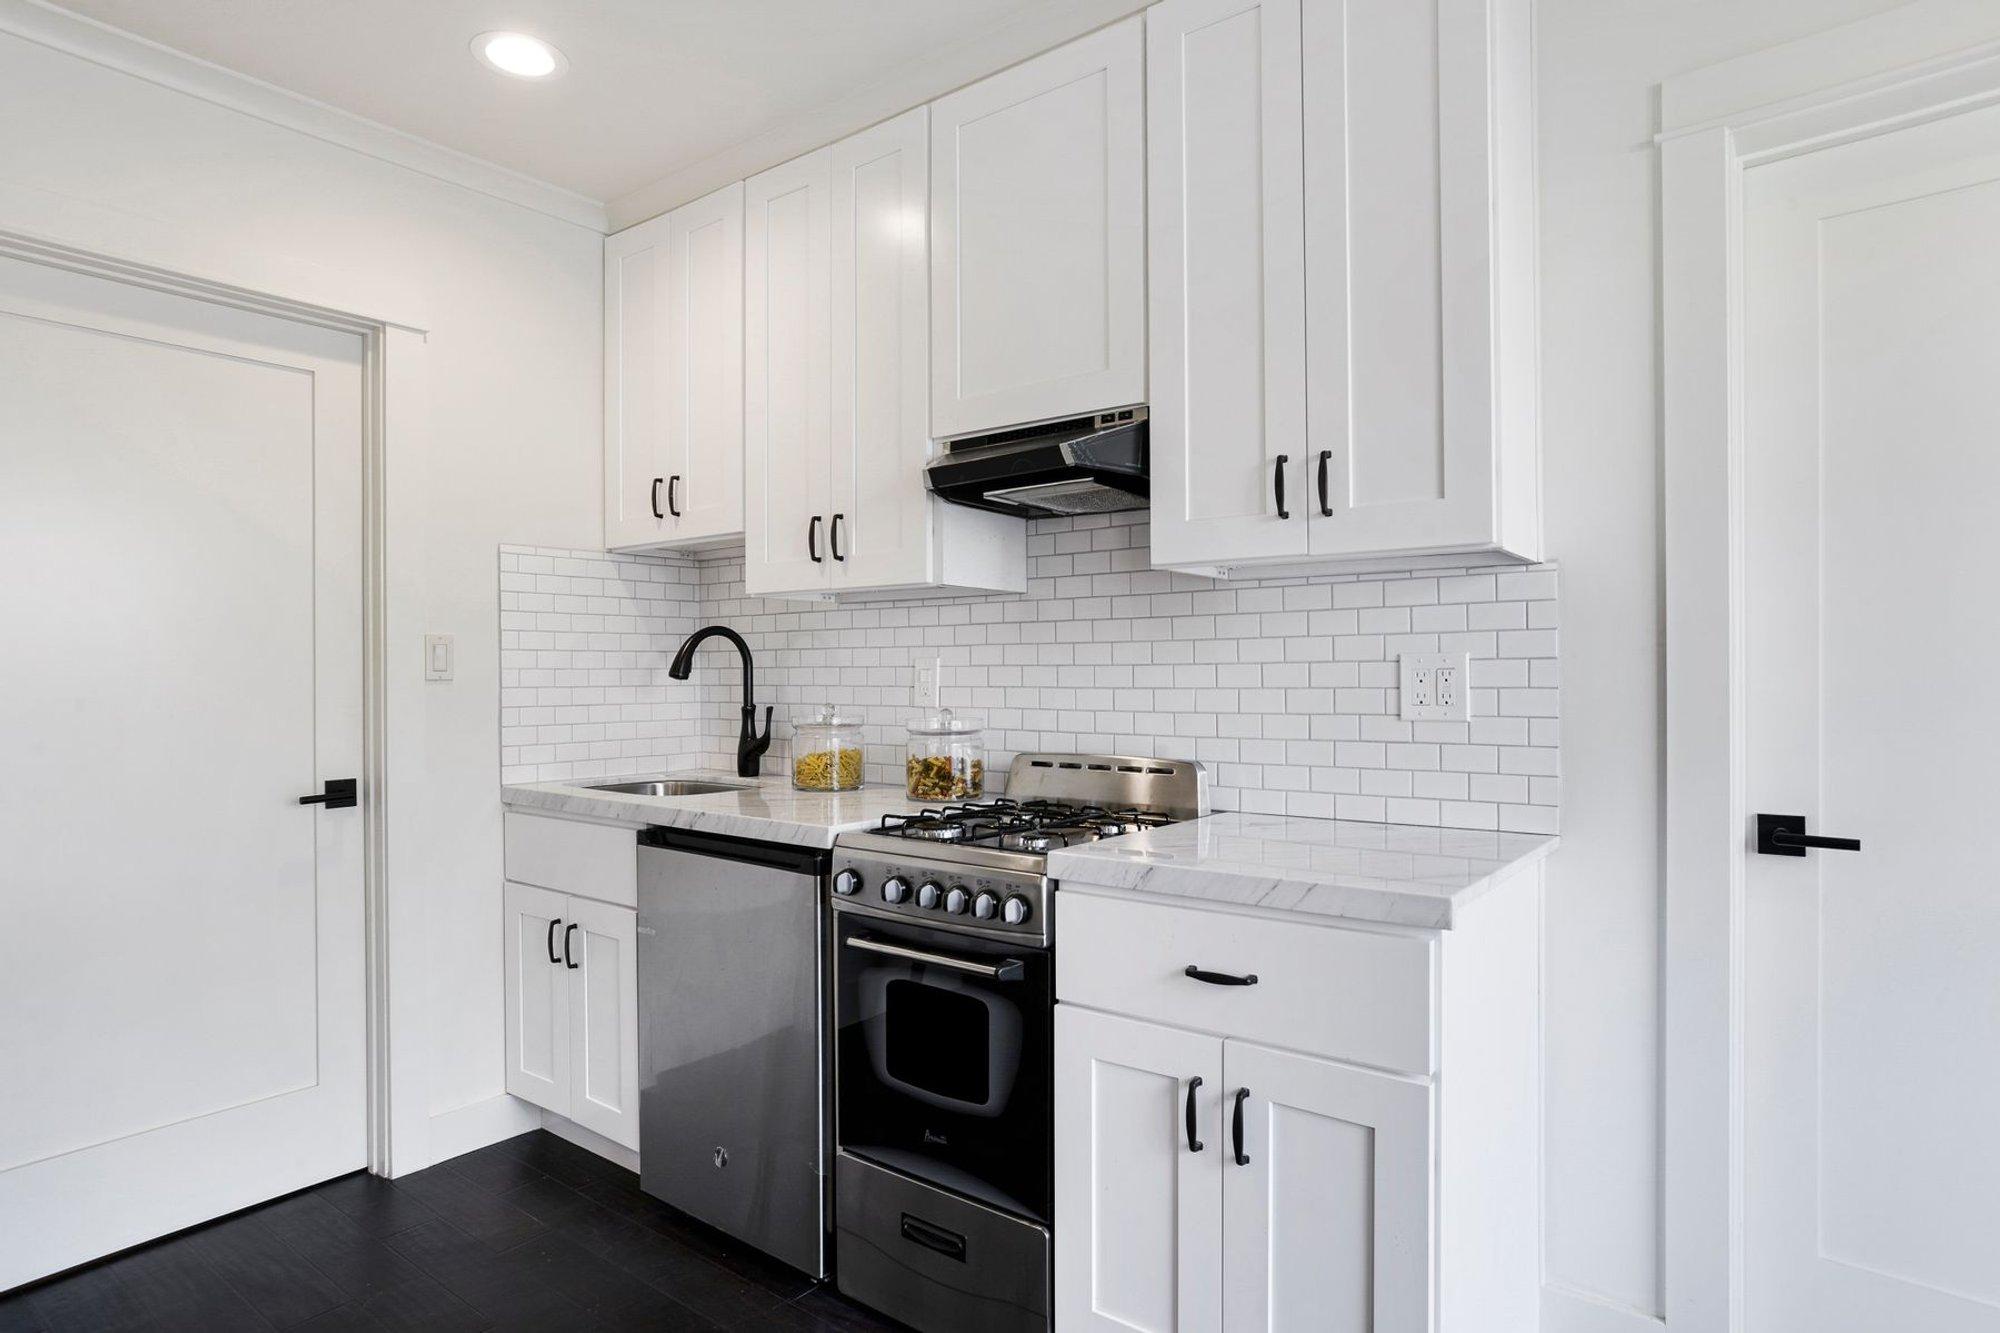 Compact ADU kitchen